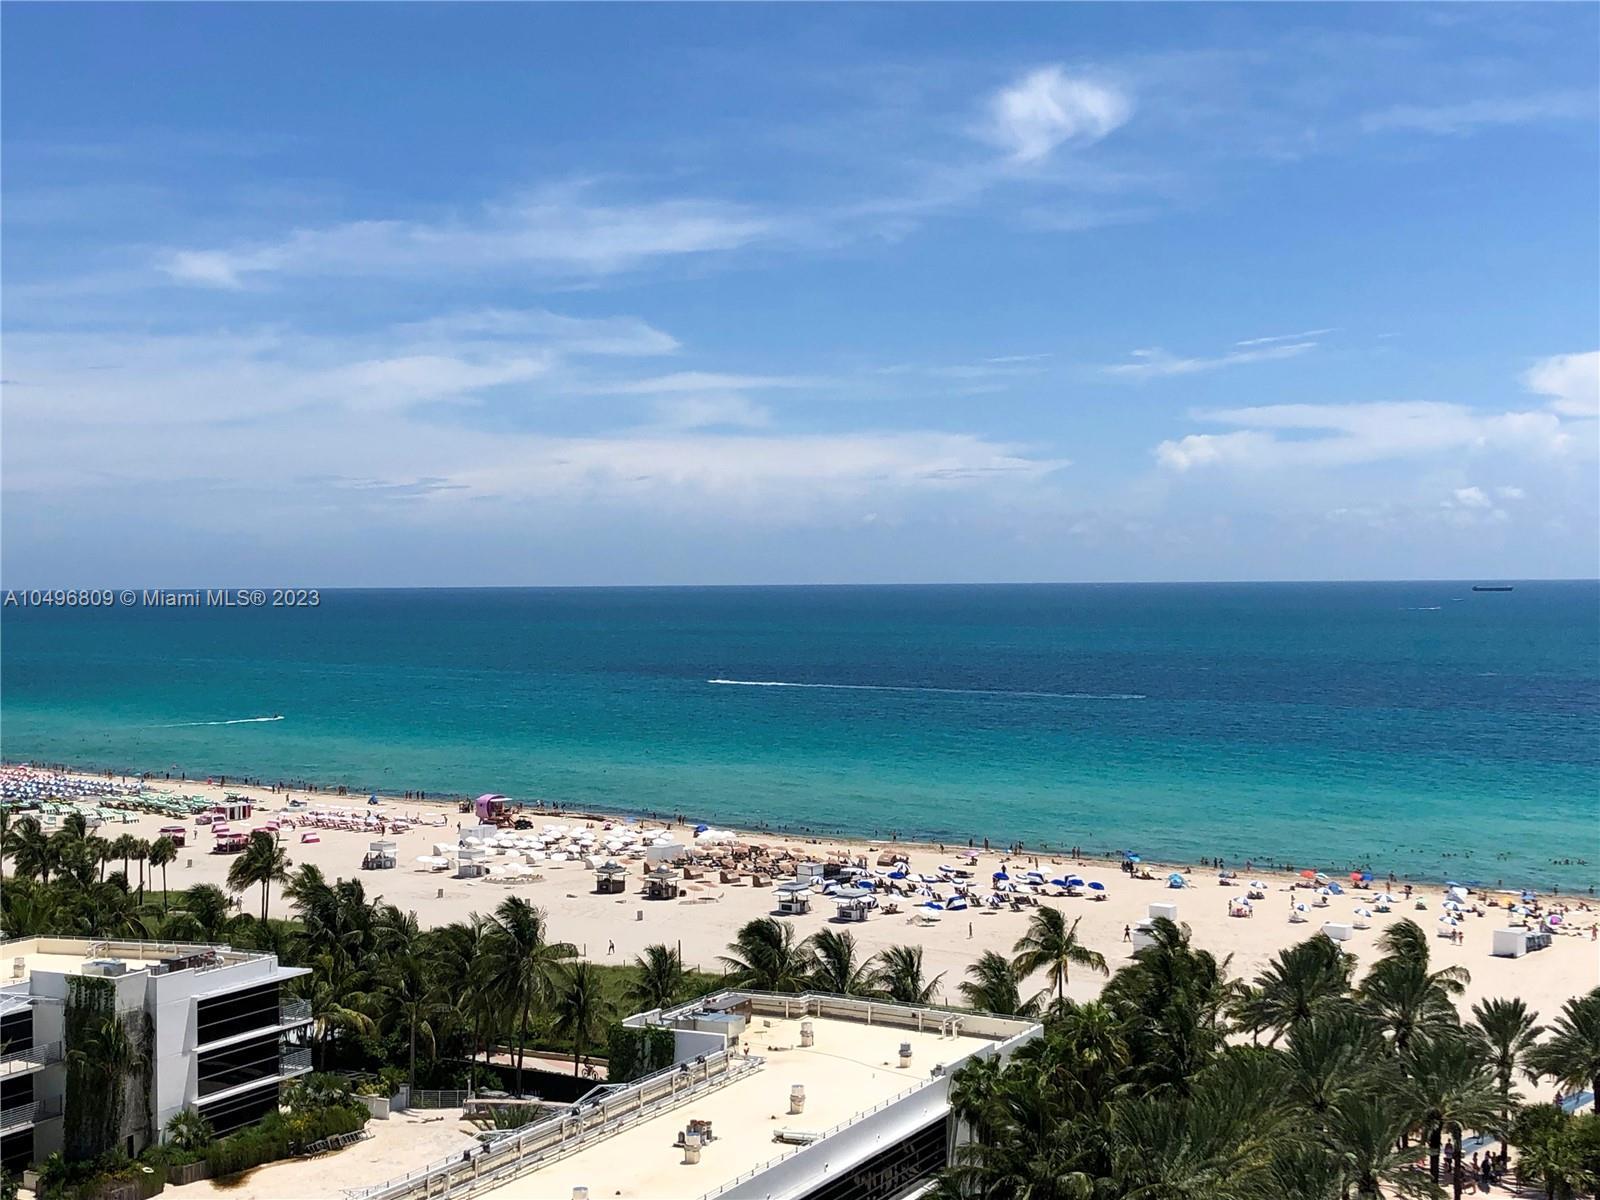 Decoplage #1423 - 100 LINCOLN RD #1423, Miami Beach, FL 33139